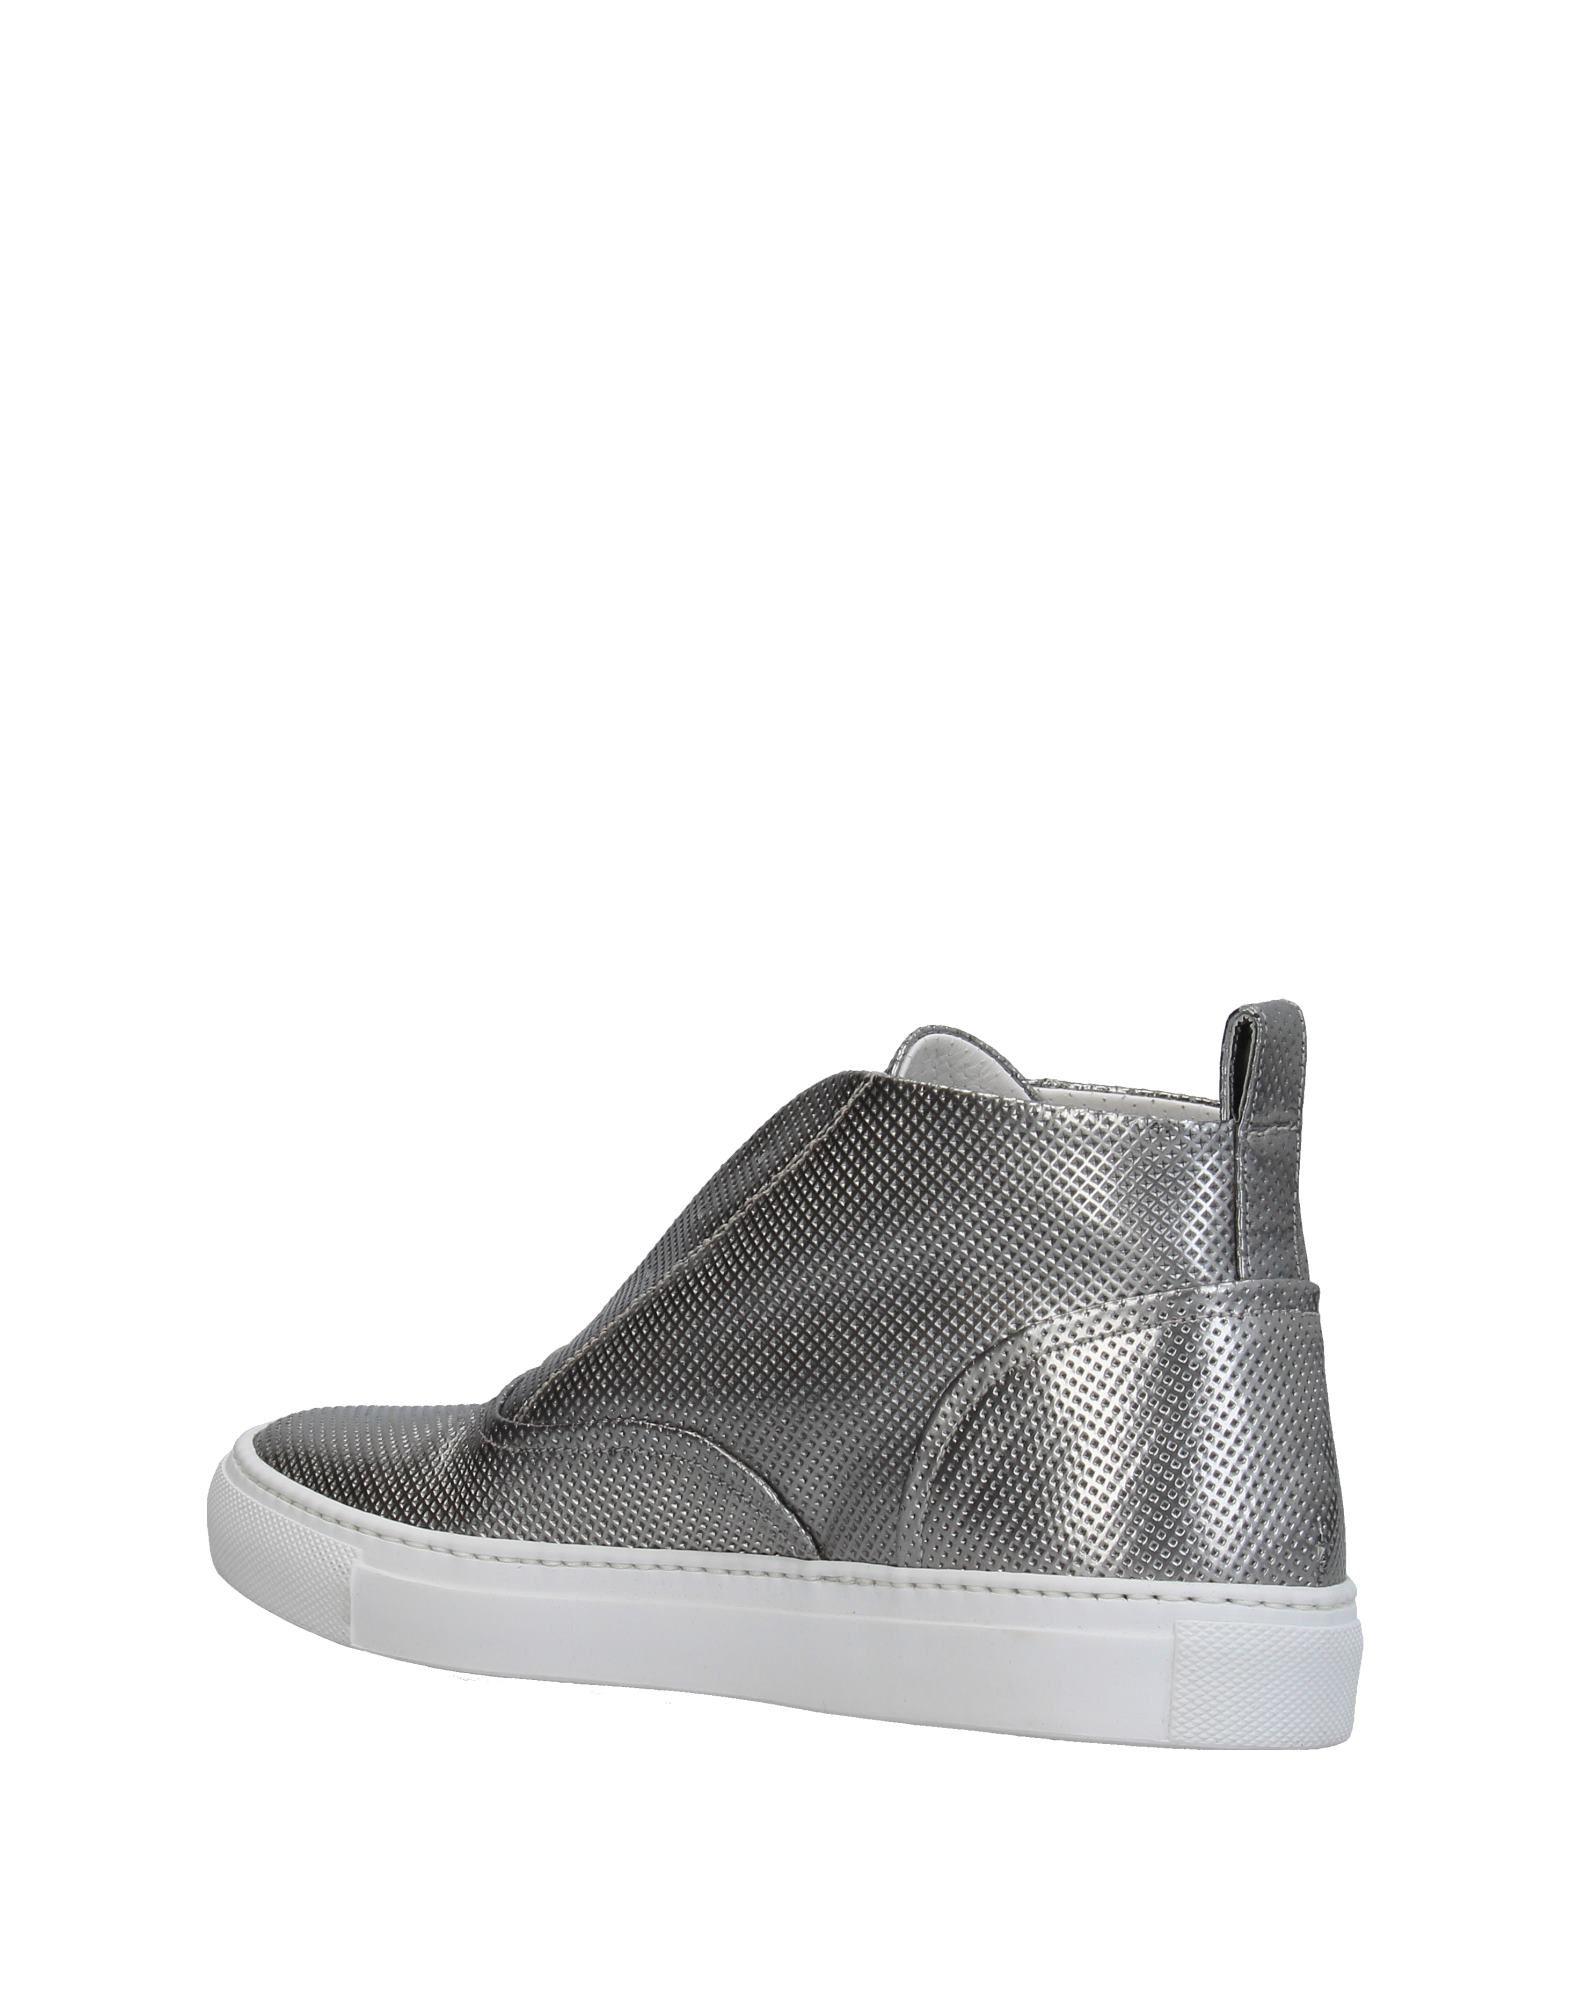 Chaussures - Tribunaux Sartore f31goY